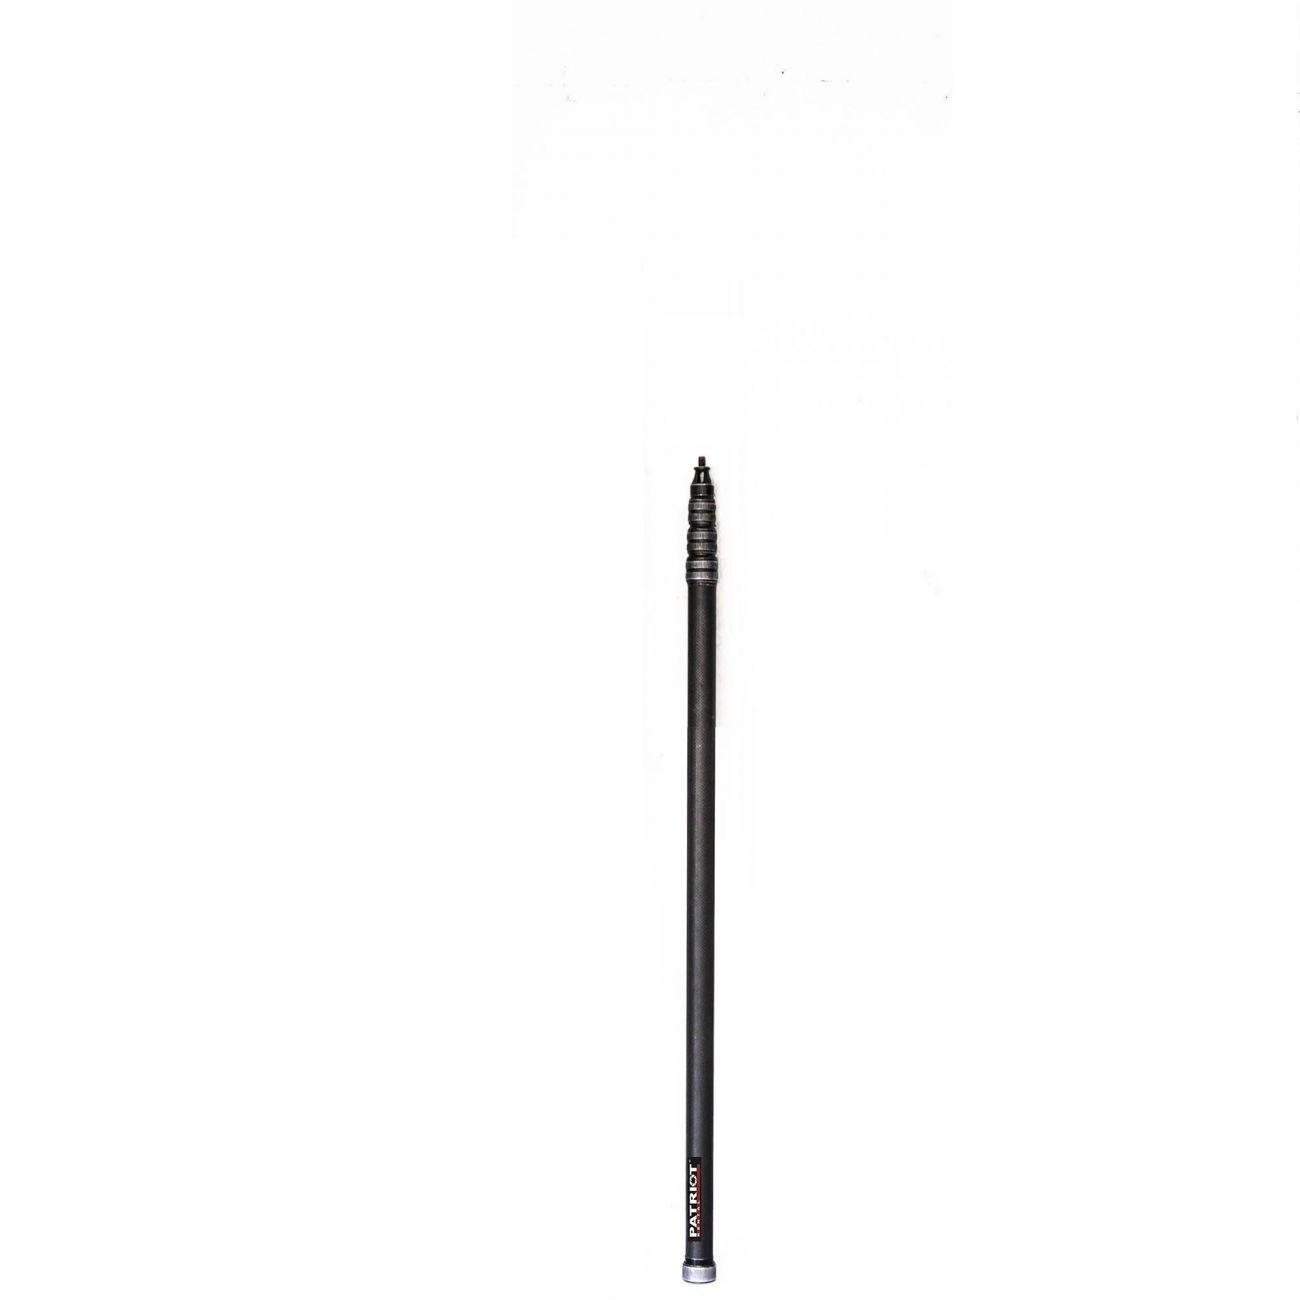 Boompole Ambient Recording QX 565 Quickpole Light 2.5 m